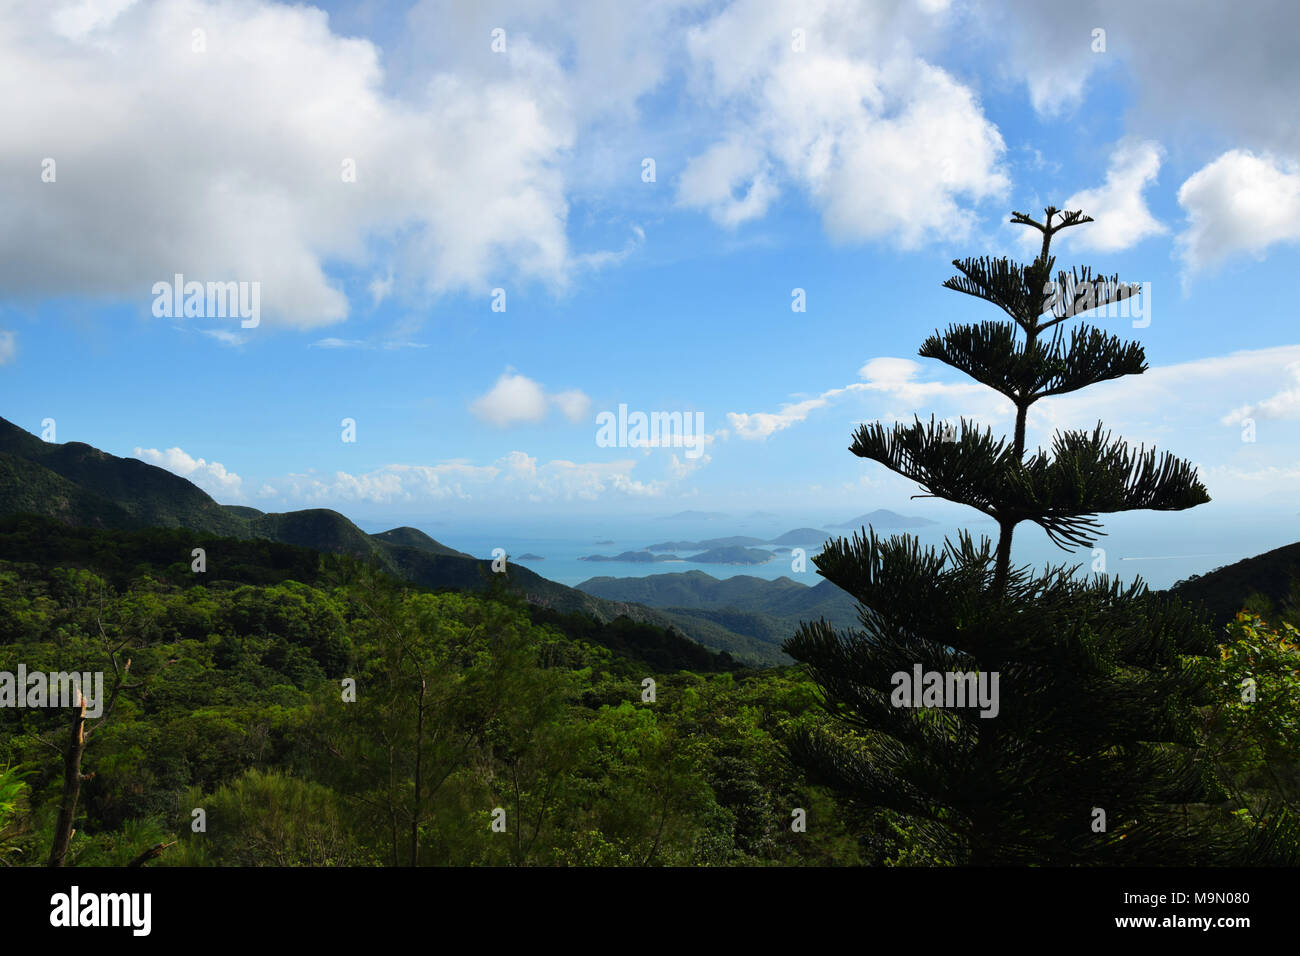 View from the platform of the Big Tian Tan Buddha on Lantau Island, Hong Kong, China - Stock Image